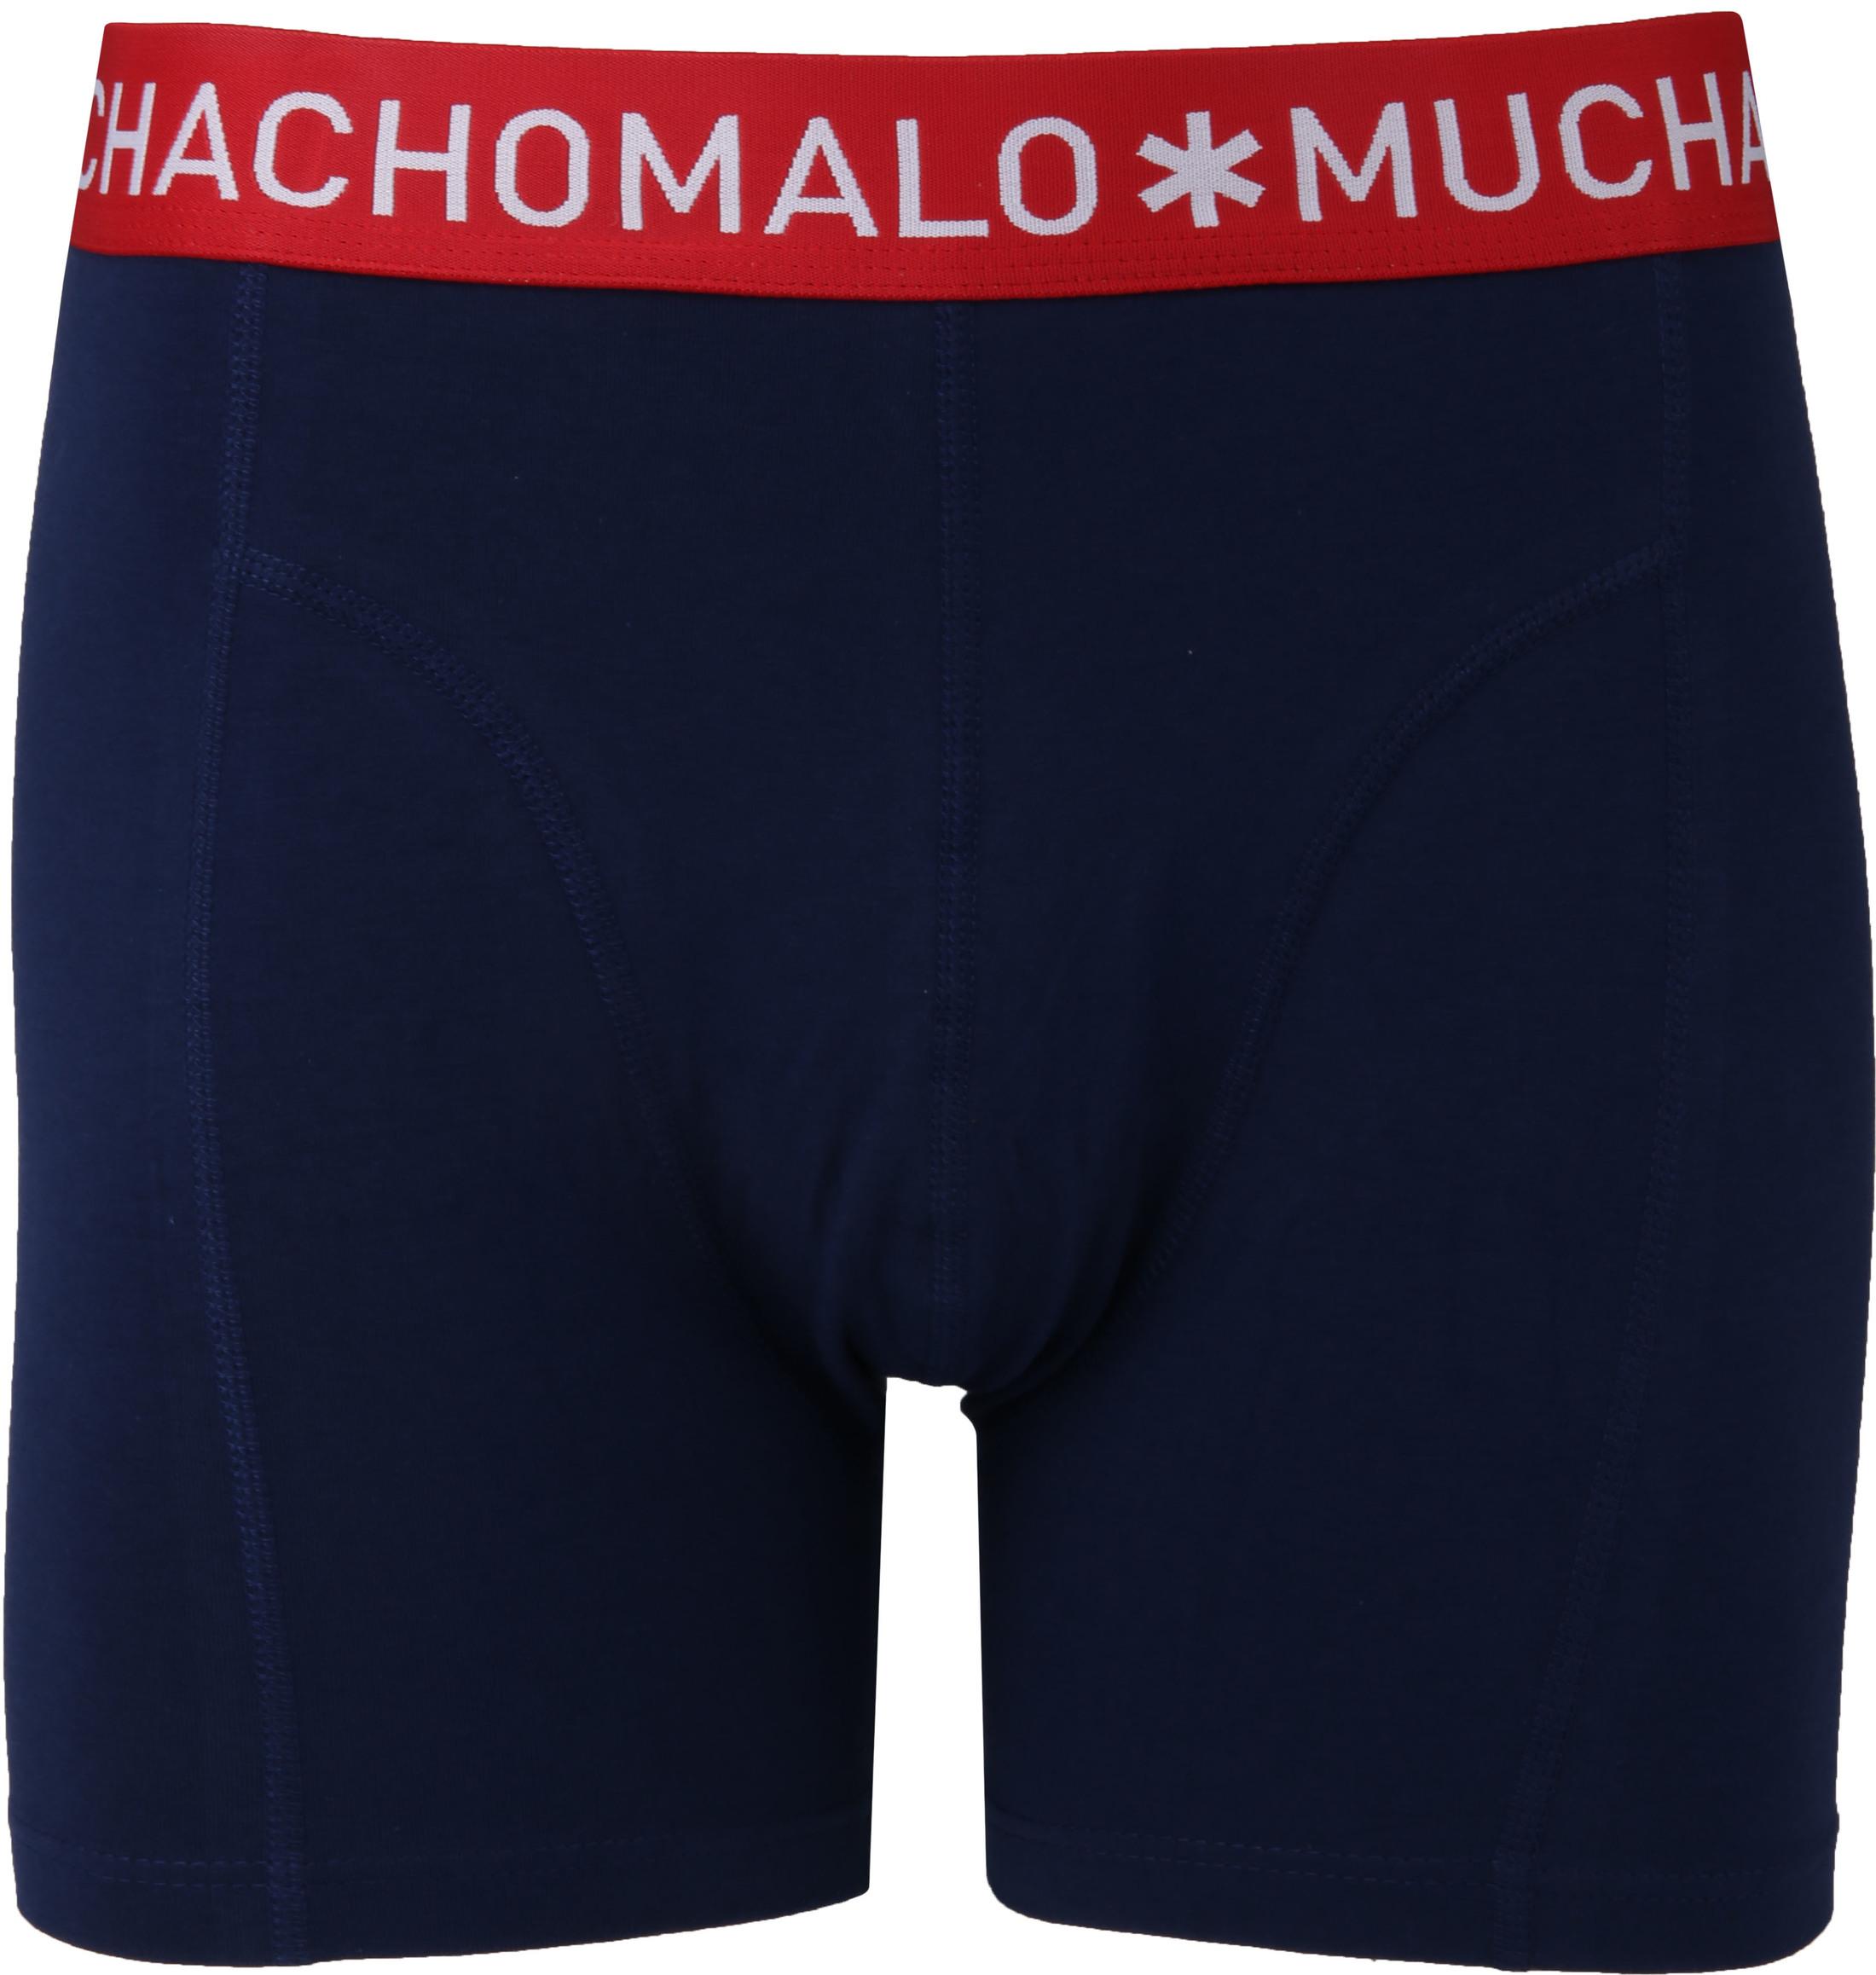 Muchachomalo Boxershorts 3-Pack 281